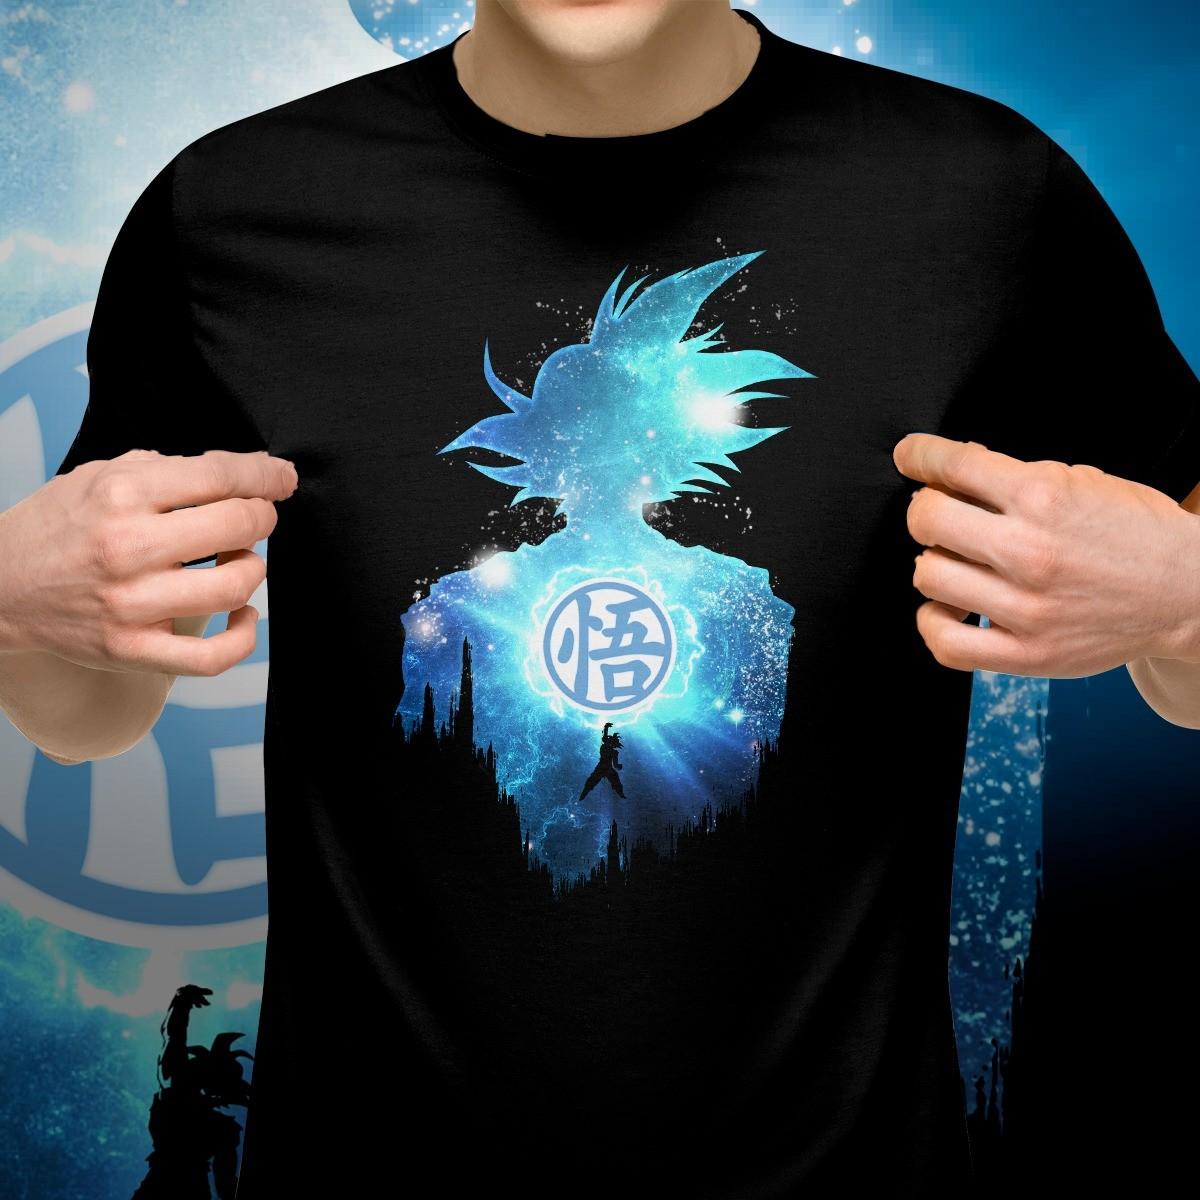 Camiseta Preta Unissex Goku: Dragon Ball Z - EV - Anime Mangá